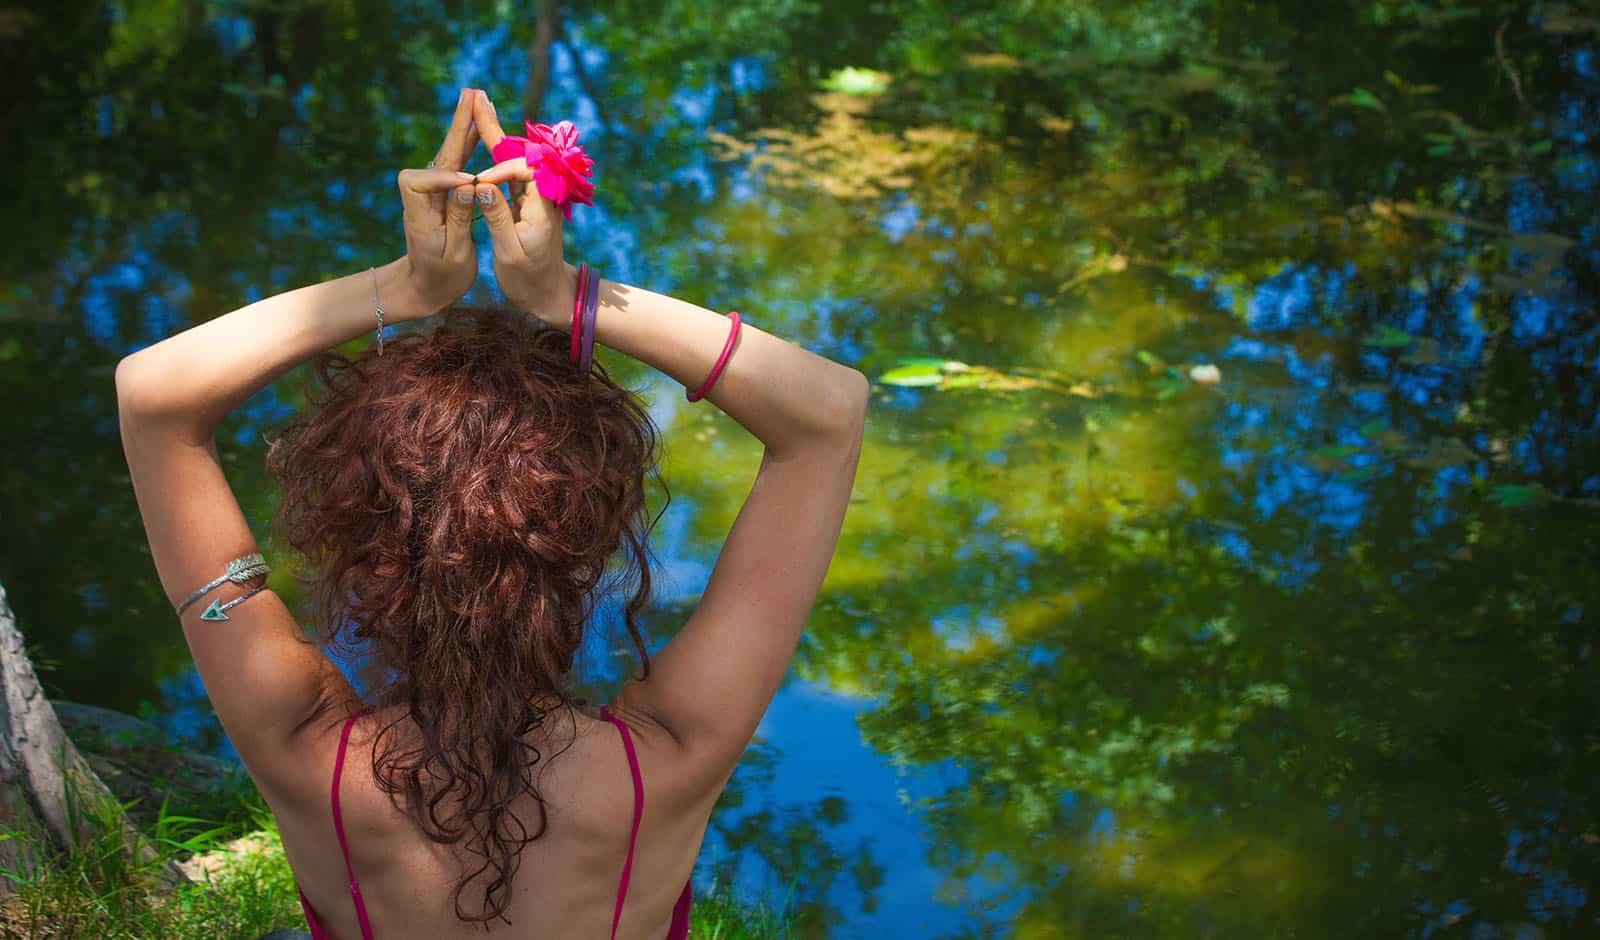 new-day-new-chance-myster-blu-main-image-woman-meditating